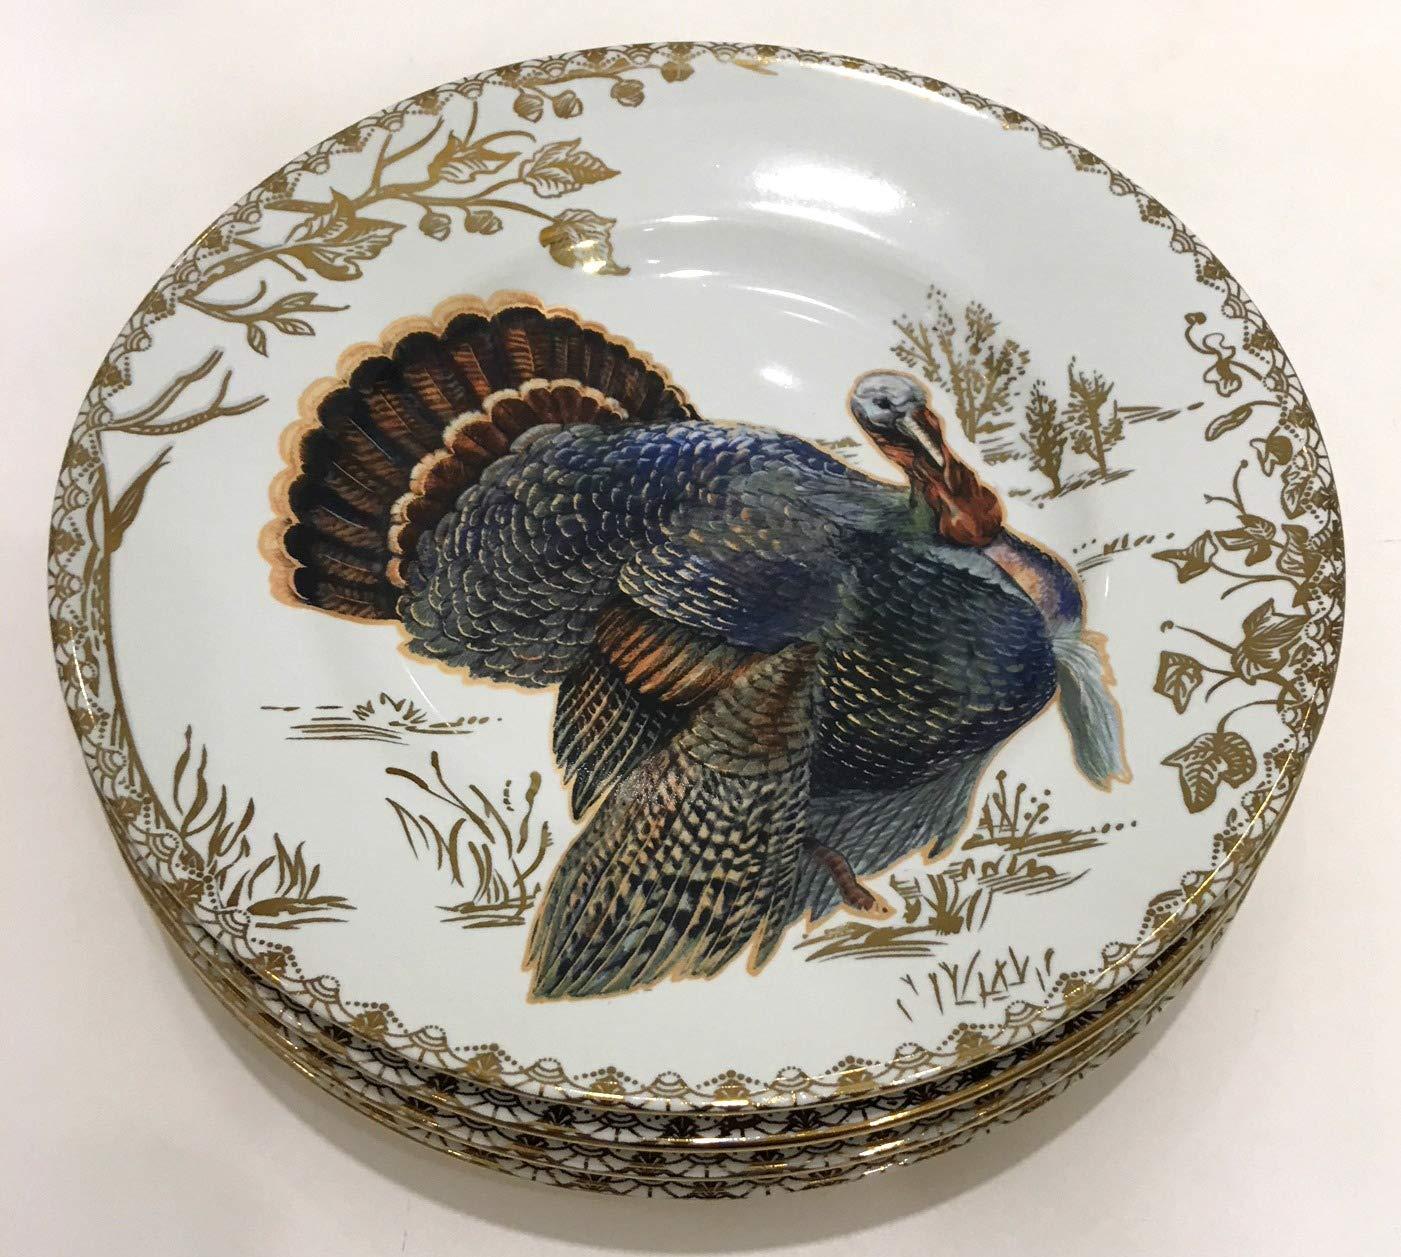 222 Fifth Golden Hill Wild Turkey Salad Plates with Gold Underside   Set of 4   Fine Porcelain